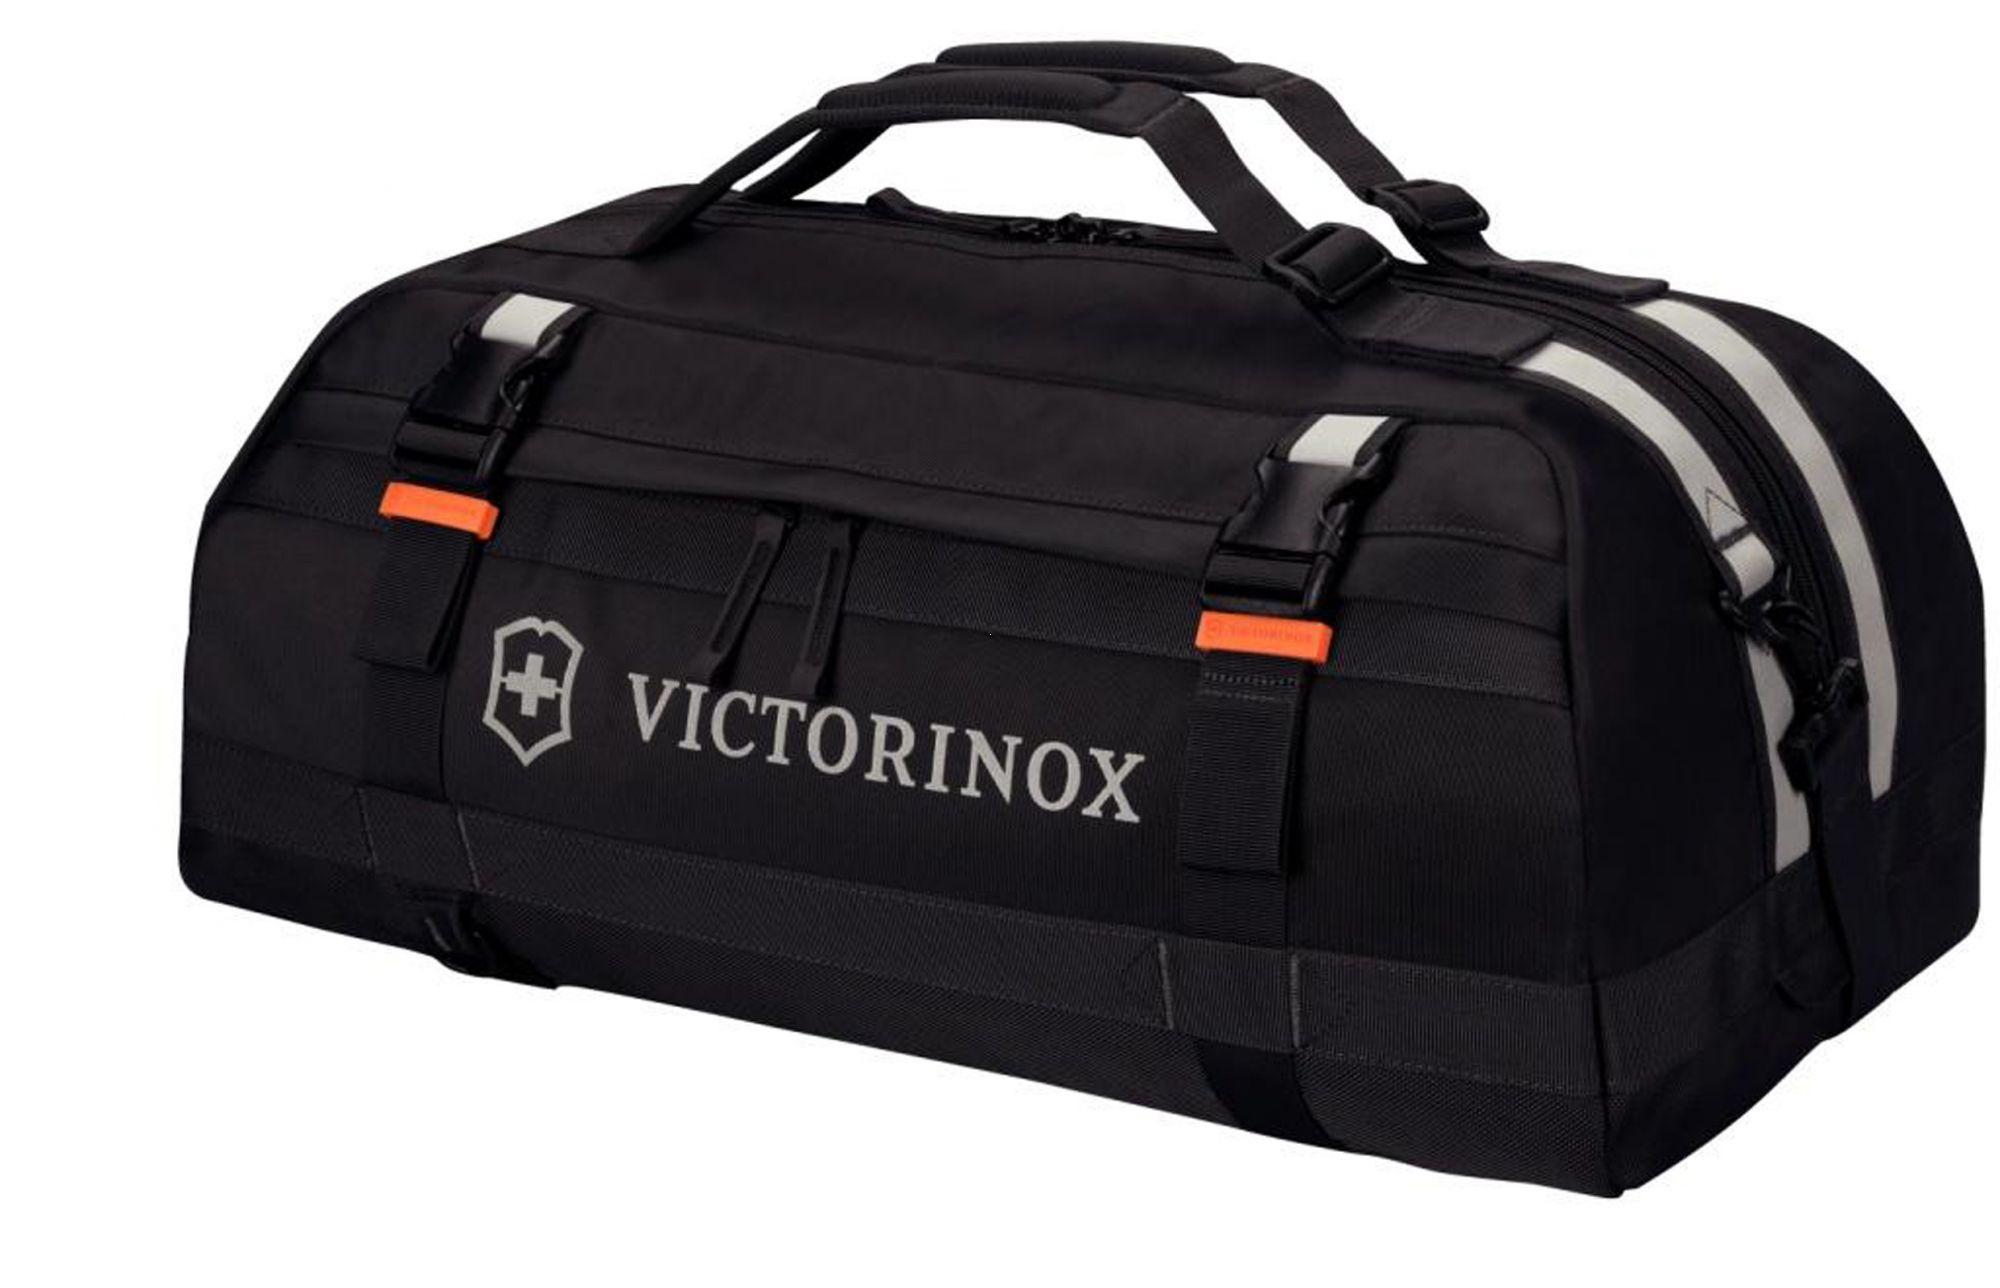 8bbab50097814 Victorinox CH-97™ 2.0 Torba podróżna